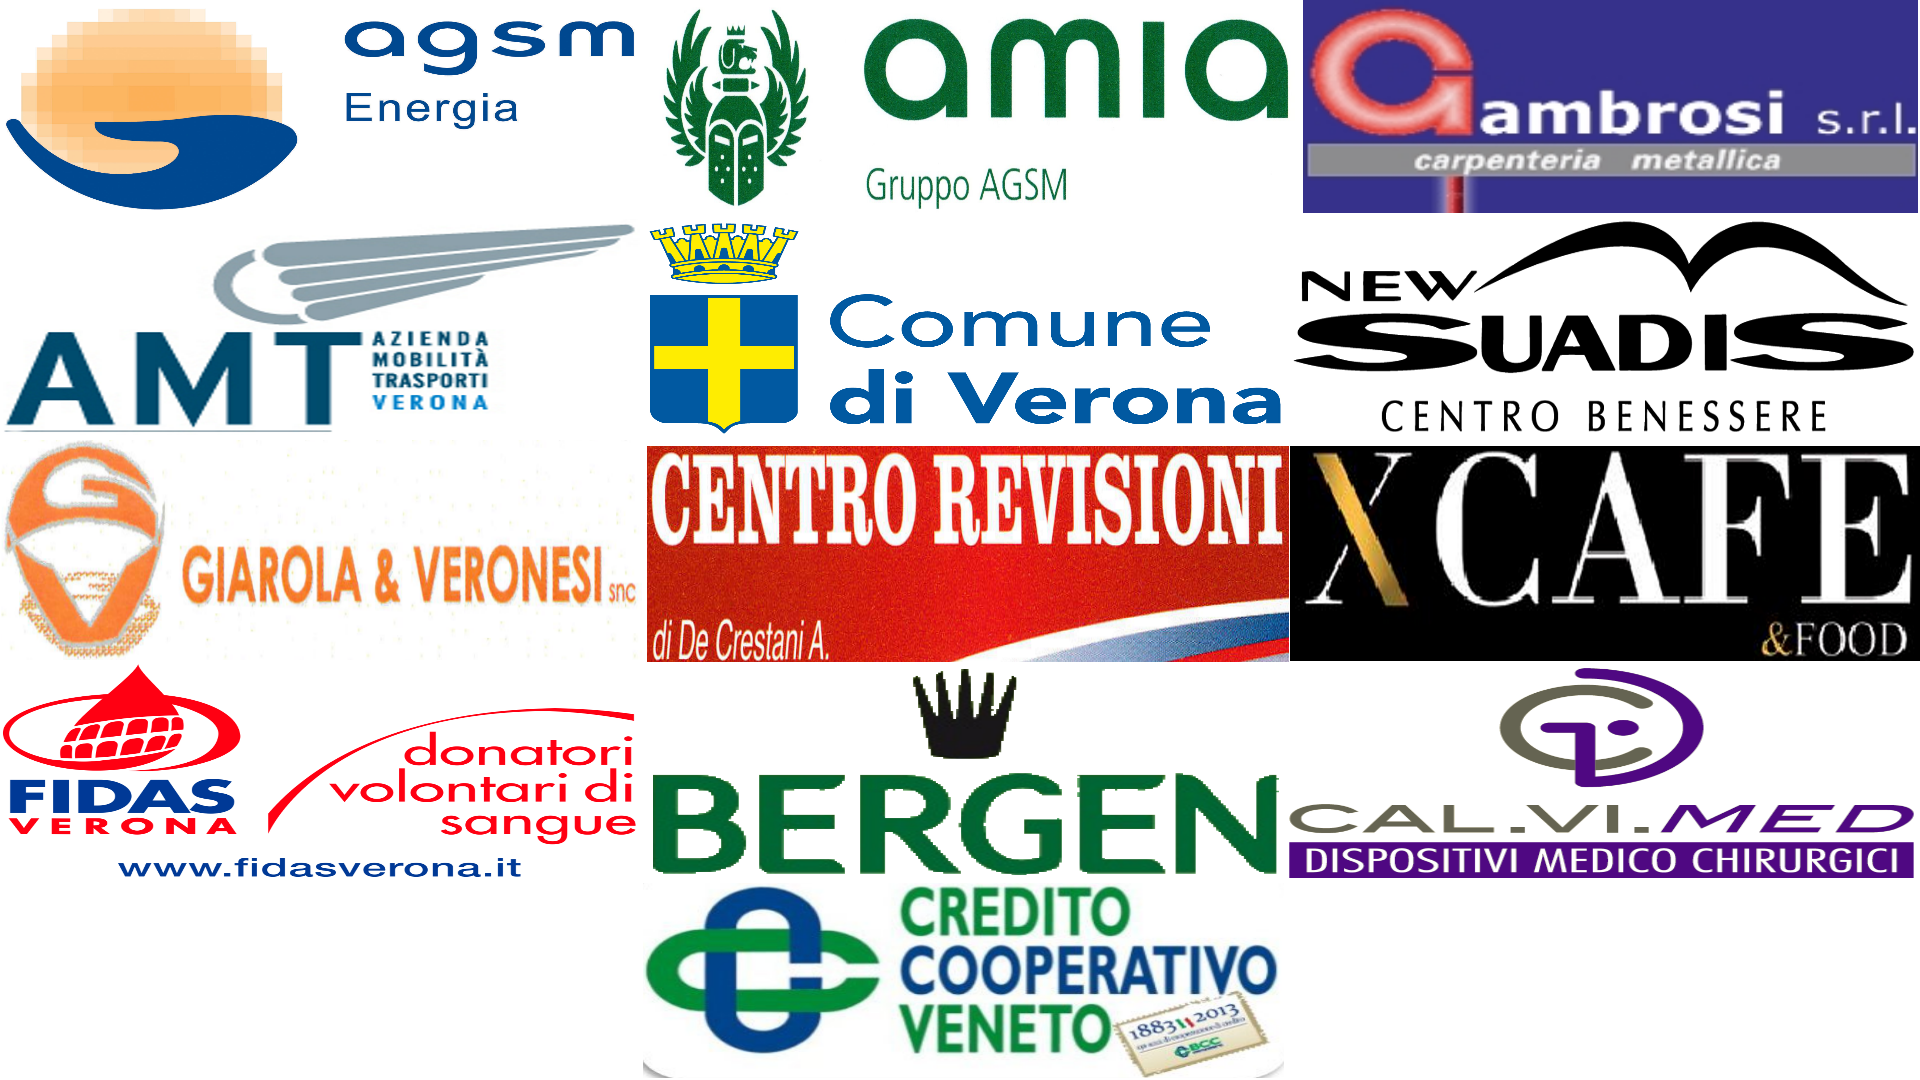 Calendario Amia Verona.Grazie A Tutti I Nostri Sponsor Audace C5 Verona